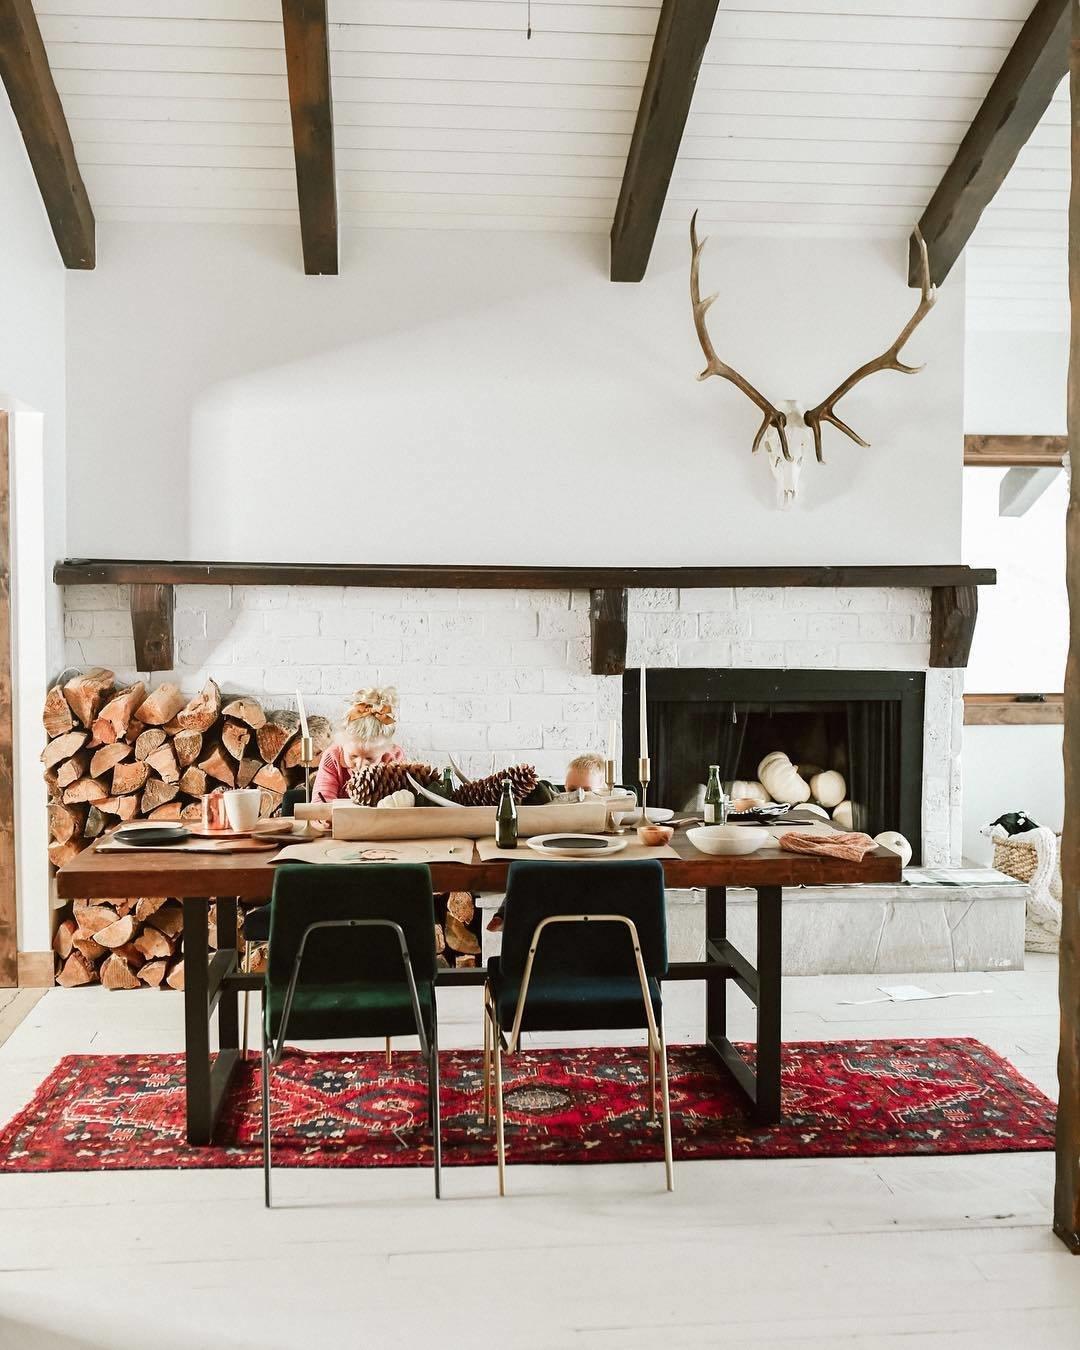 Suzy Holman renovated kitchen